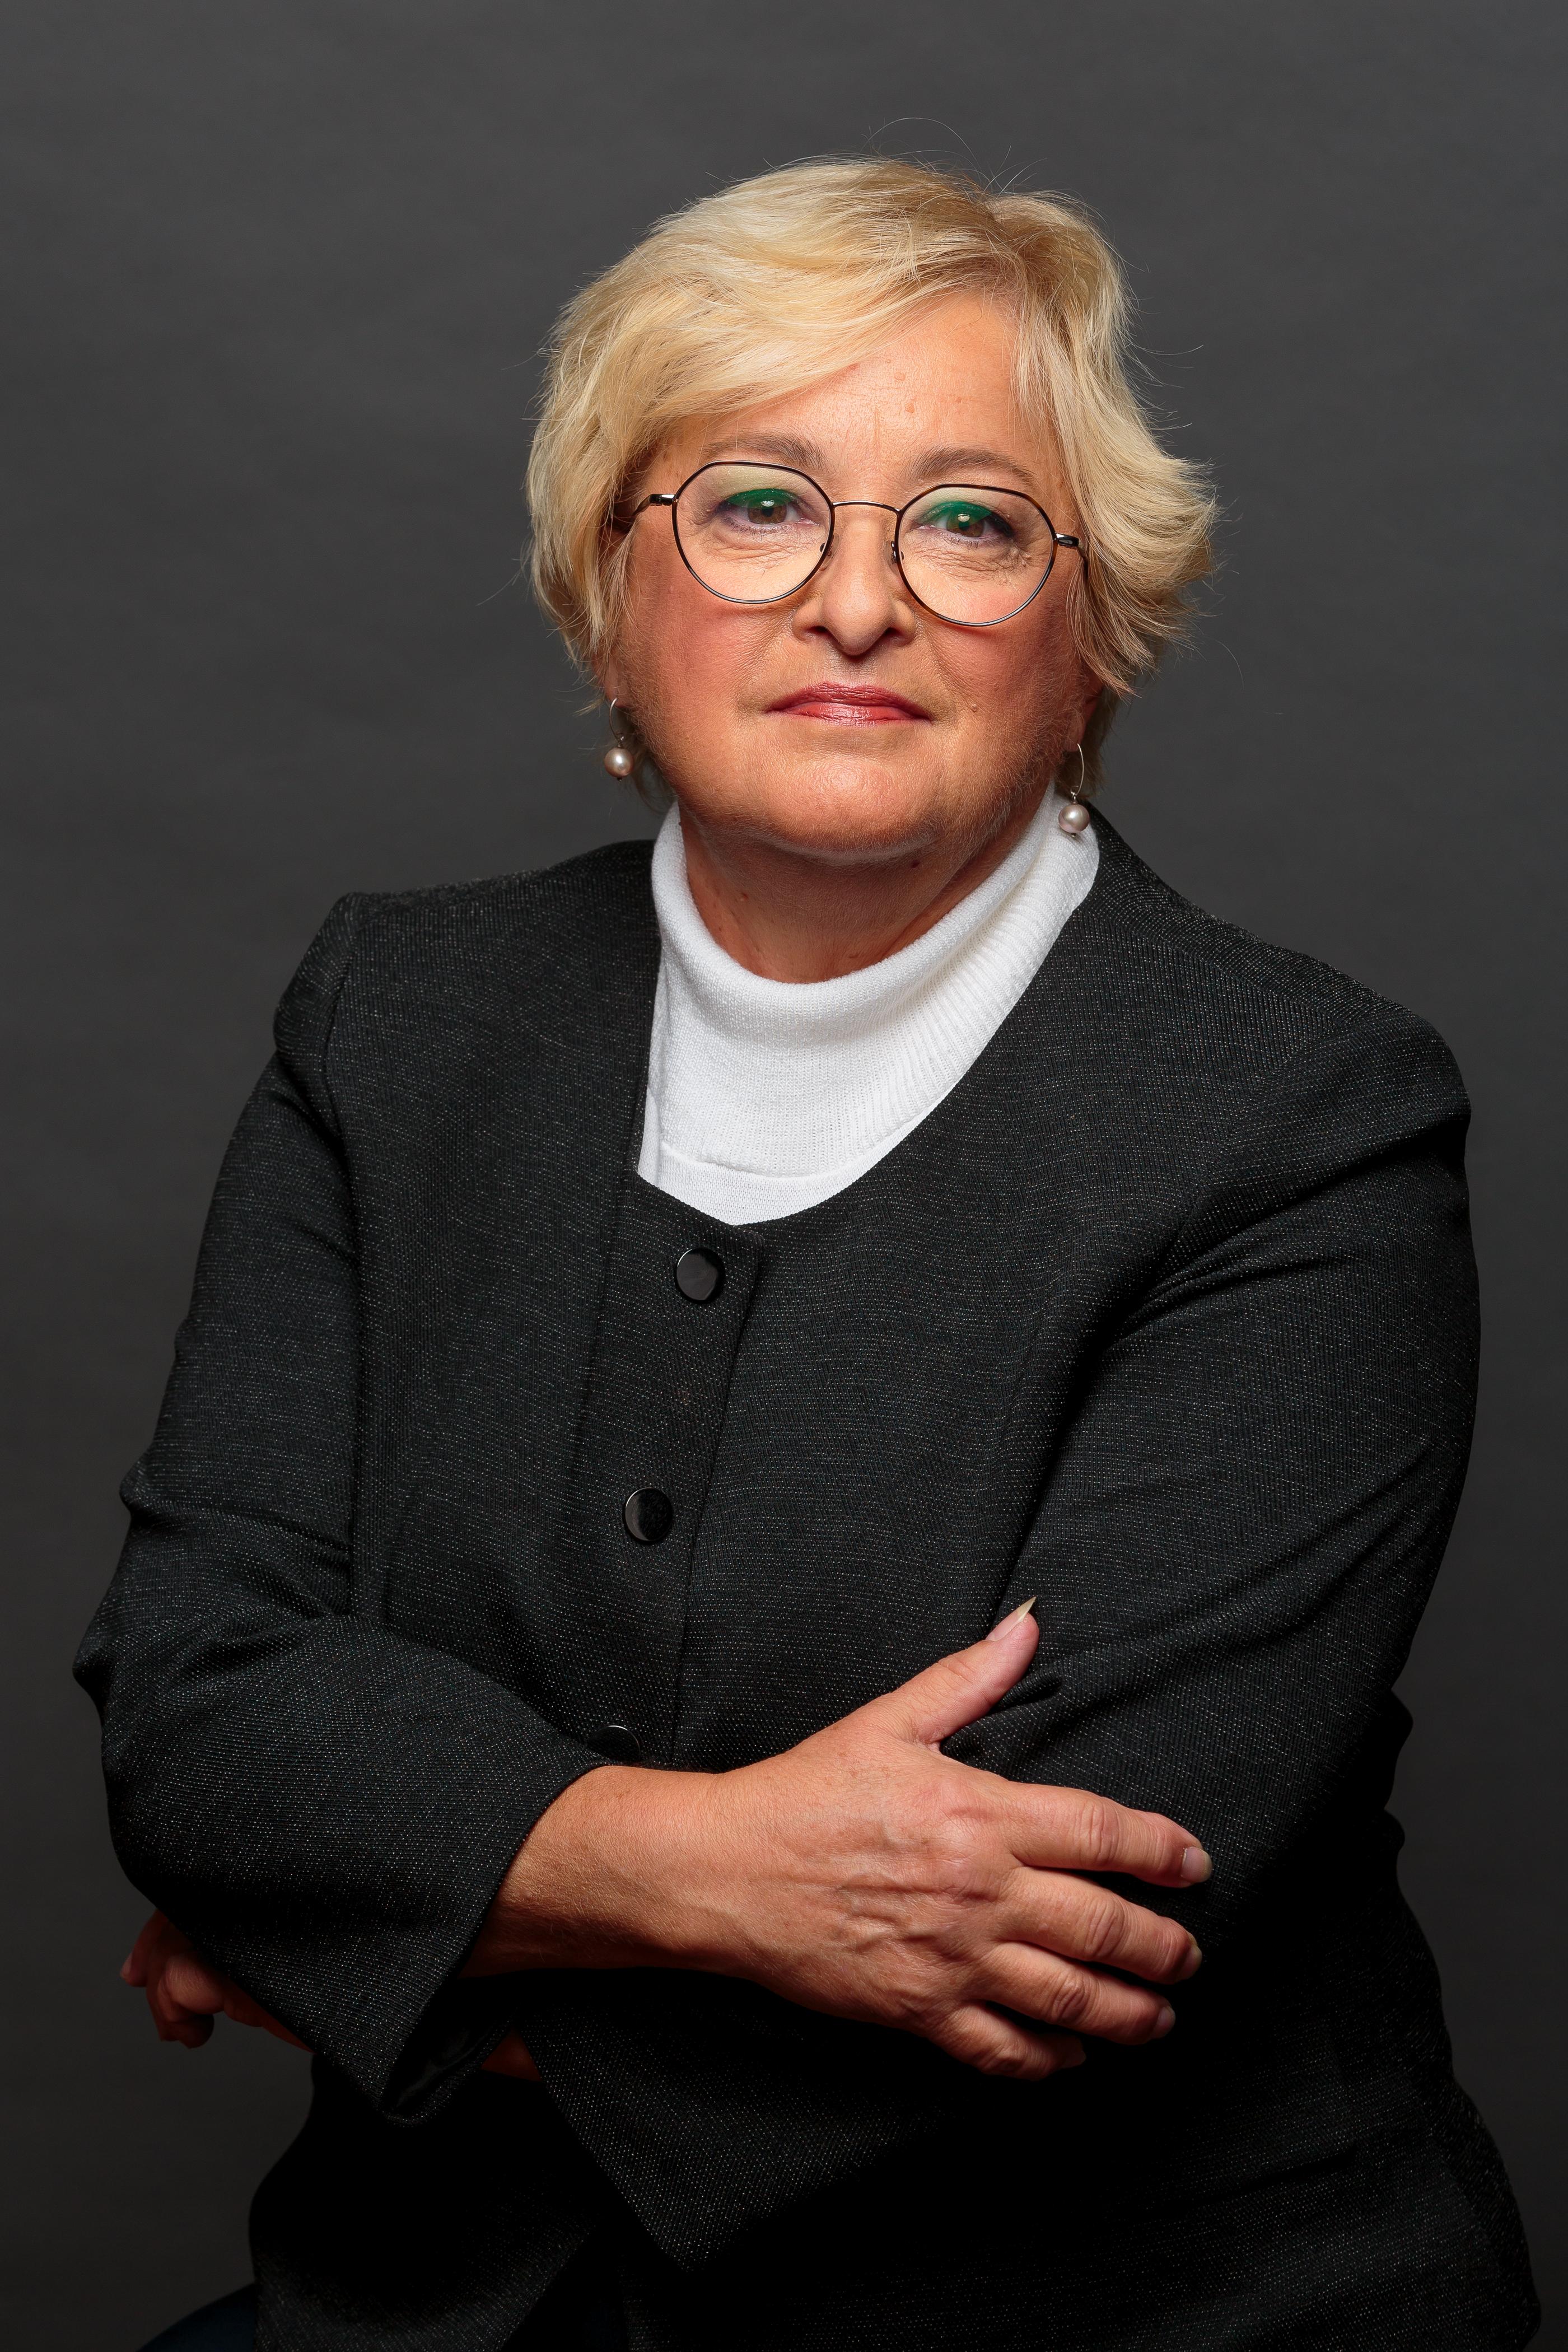 State Senator Karen Tallian